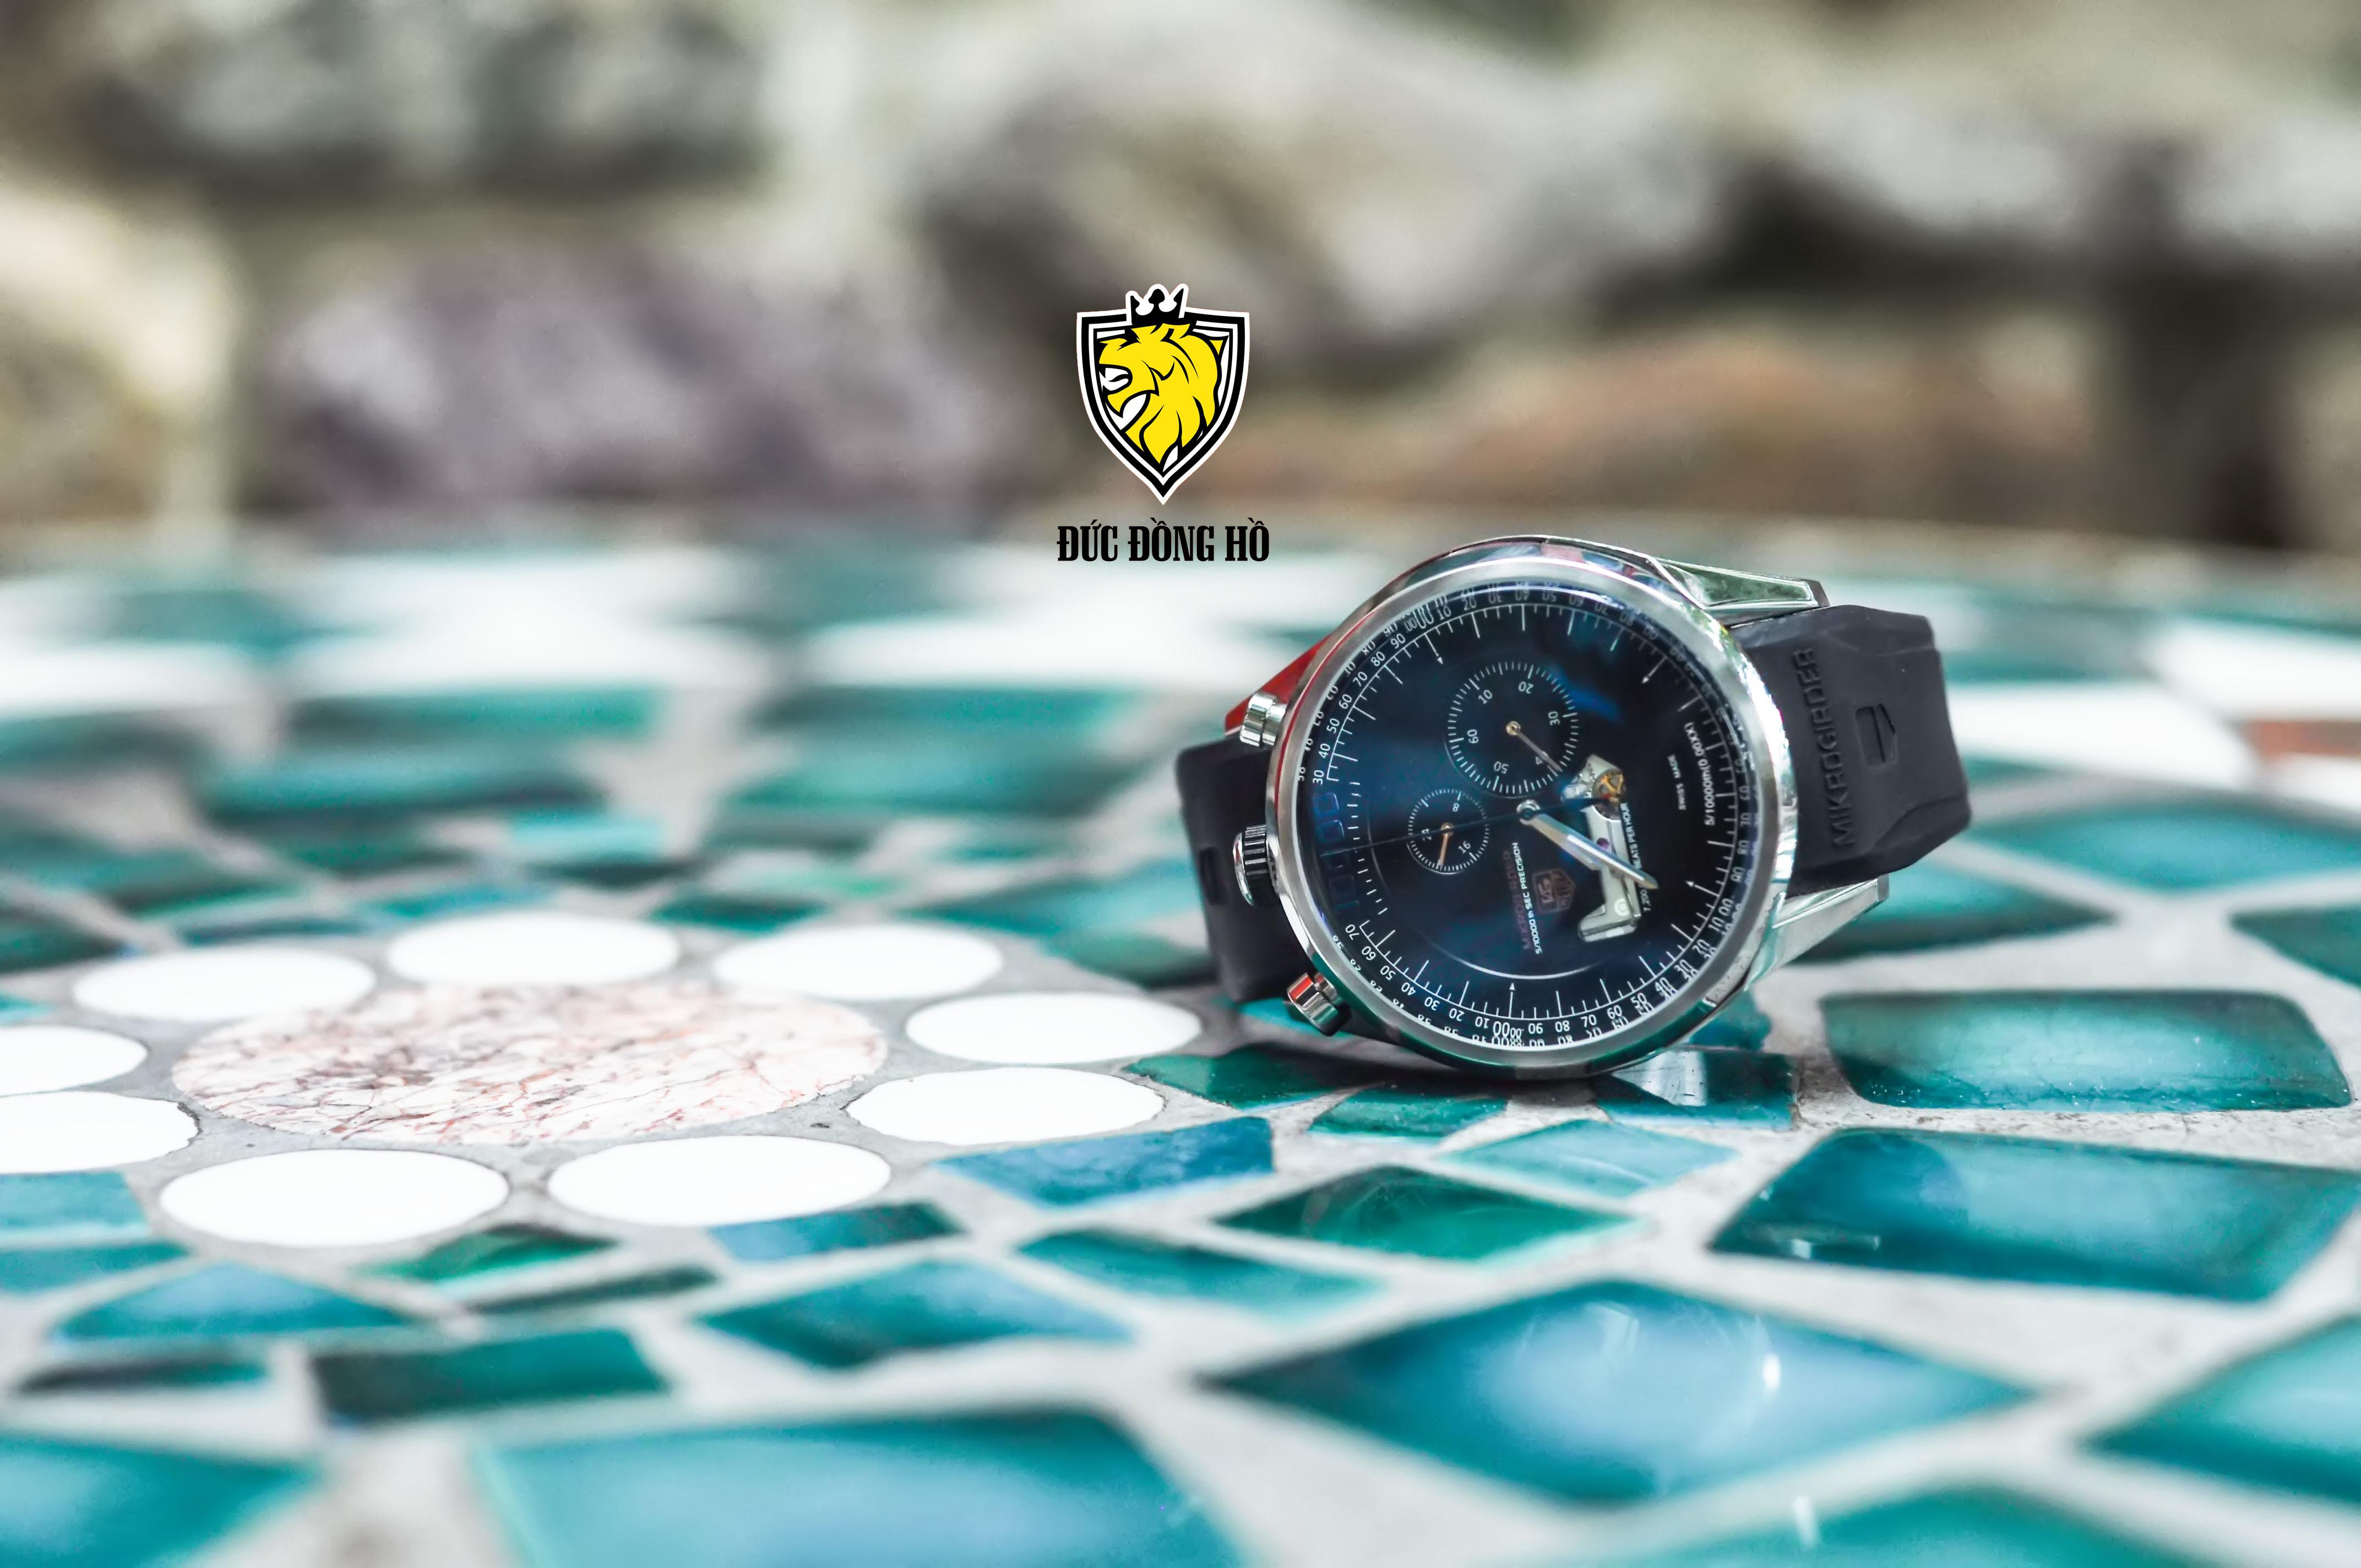 Đồng hồ Tag Heuer Nam 131.1